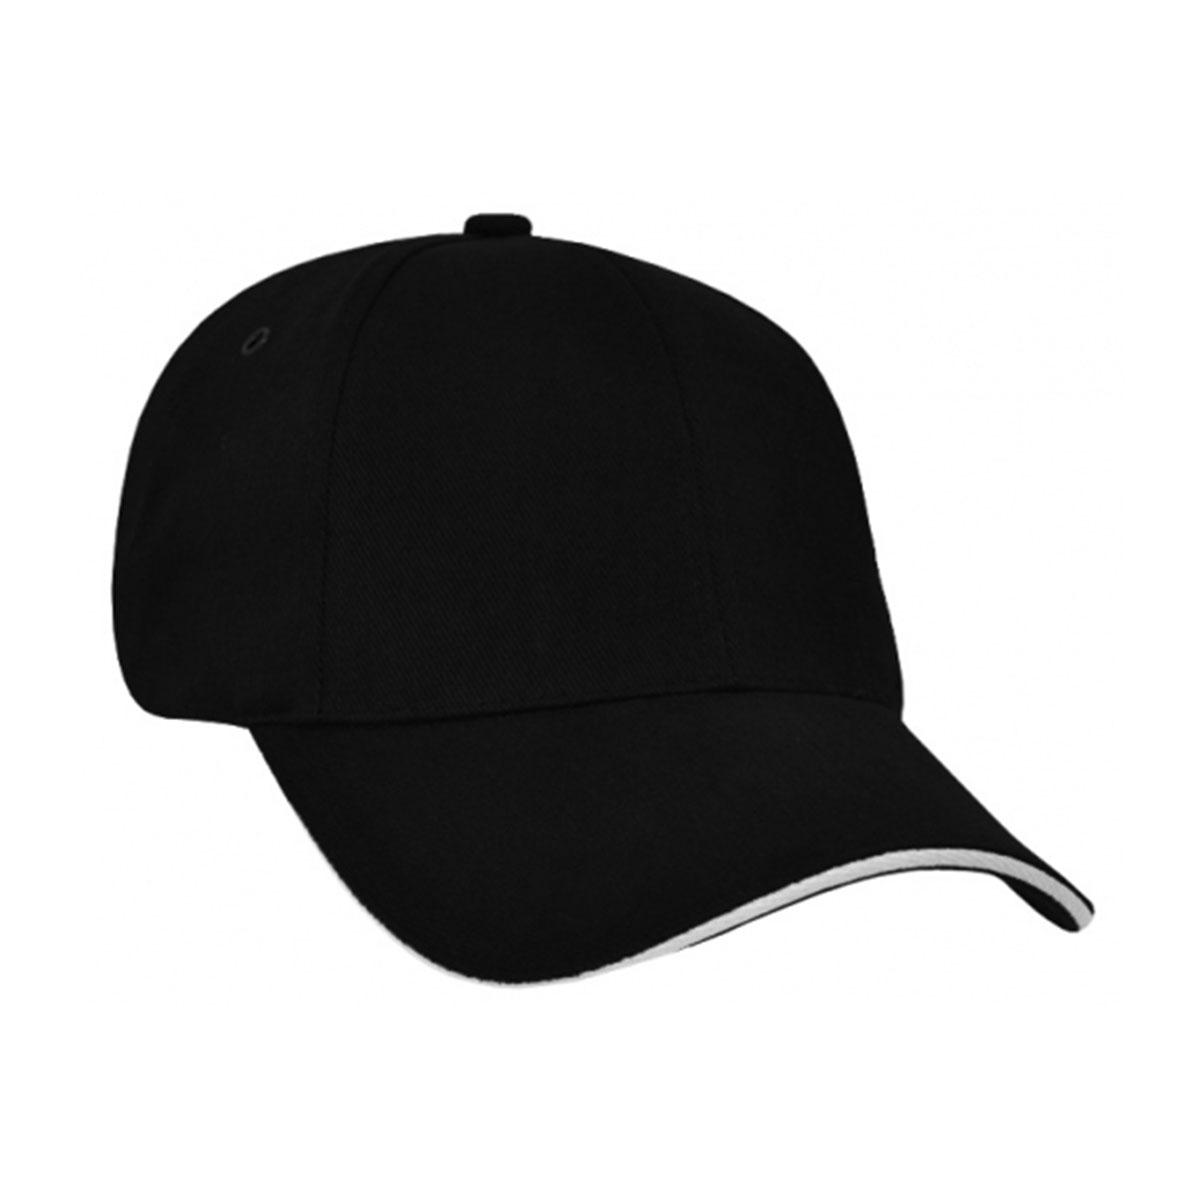 HBC Sandwich Peak Cap-Black / White